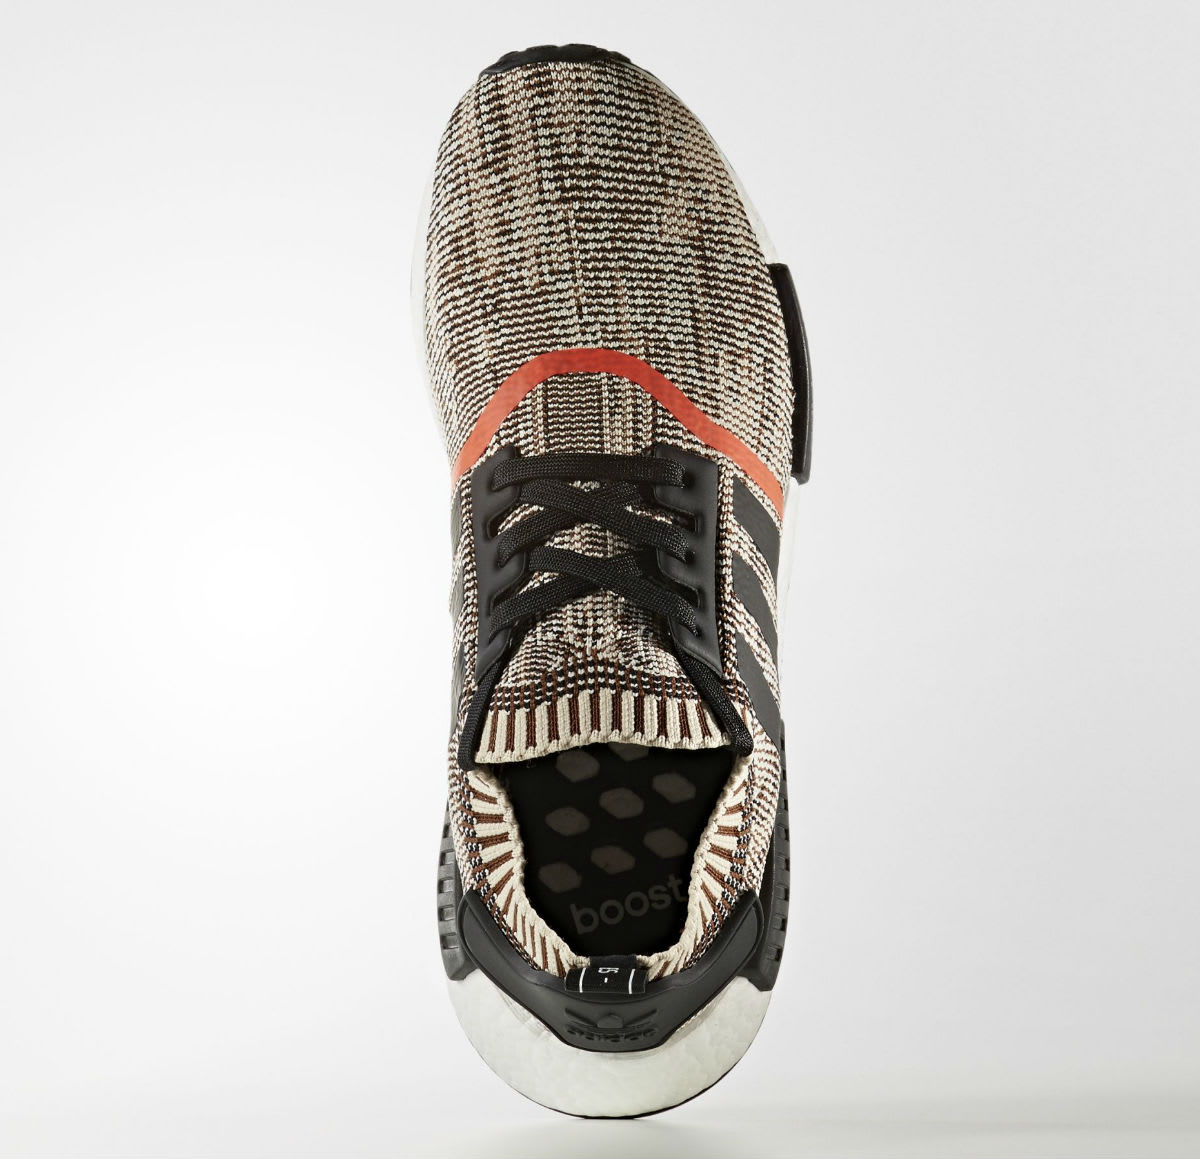 Adidas NMD R1 Primeknit Core Black Orange Release Date Top CQ1862